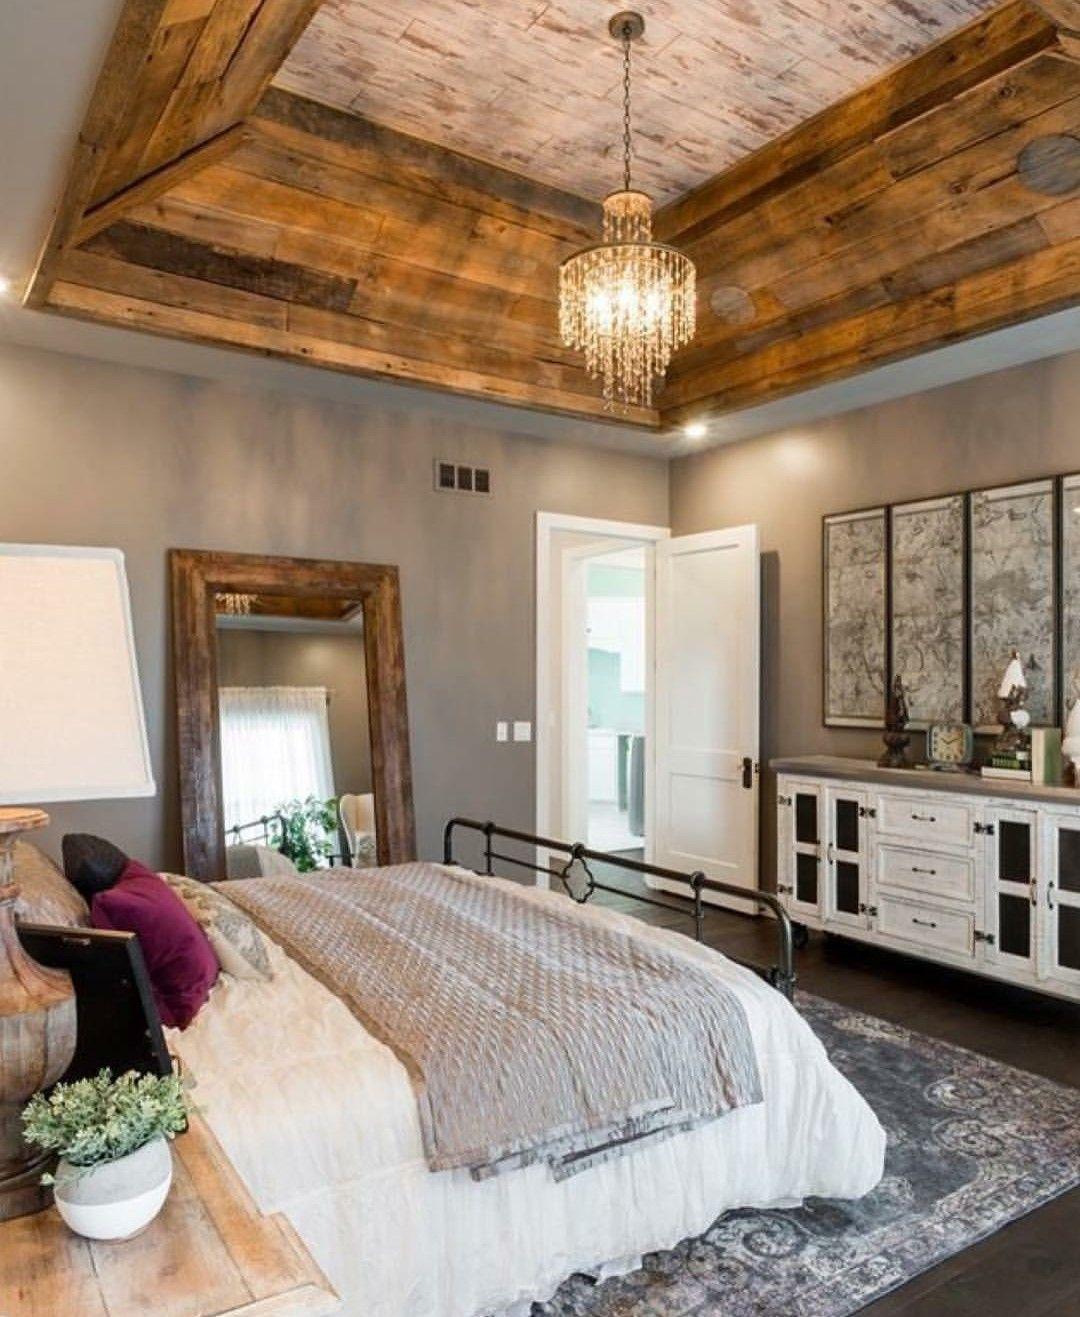 Master Bedroom Tray Ceiling Designs: Insta And Pinterest @amymckeown5